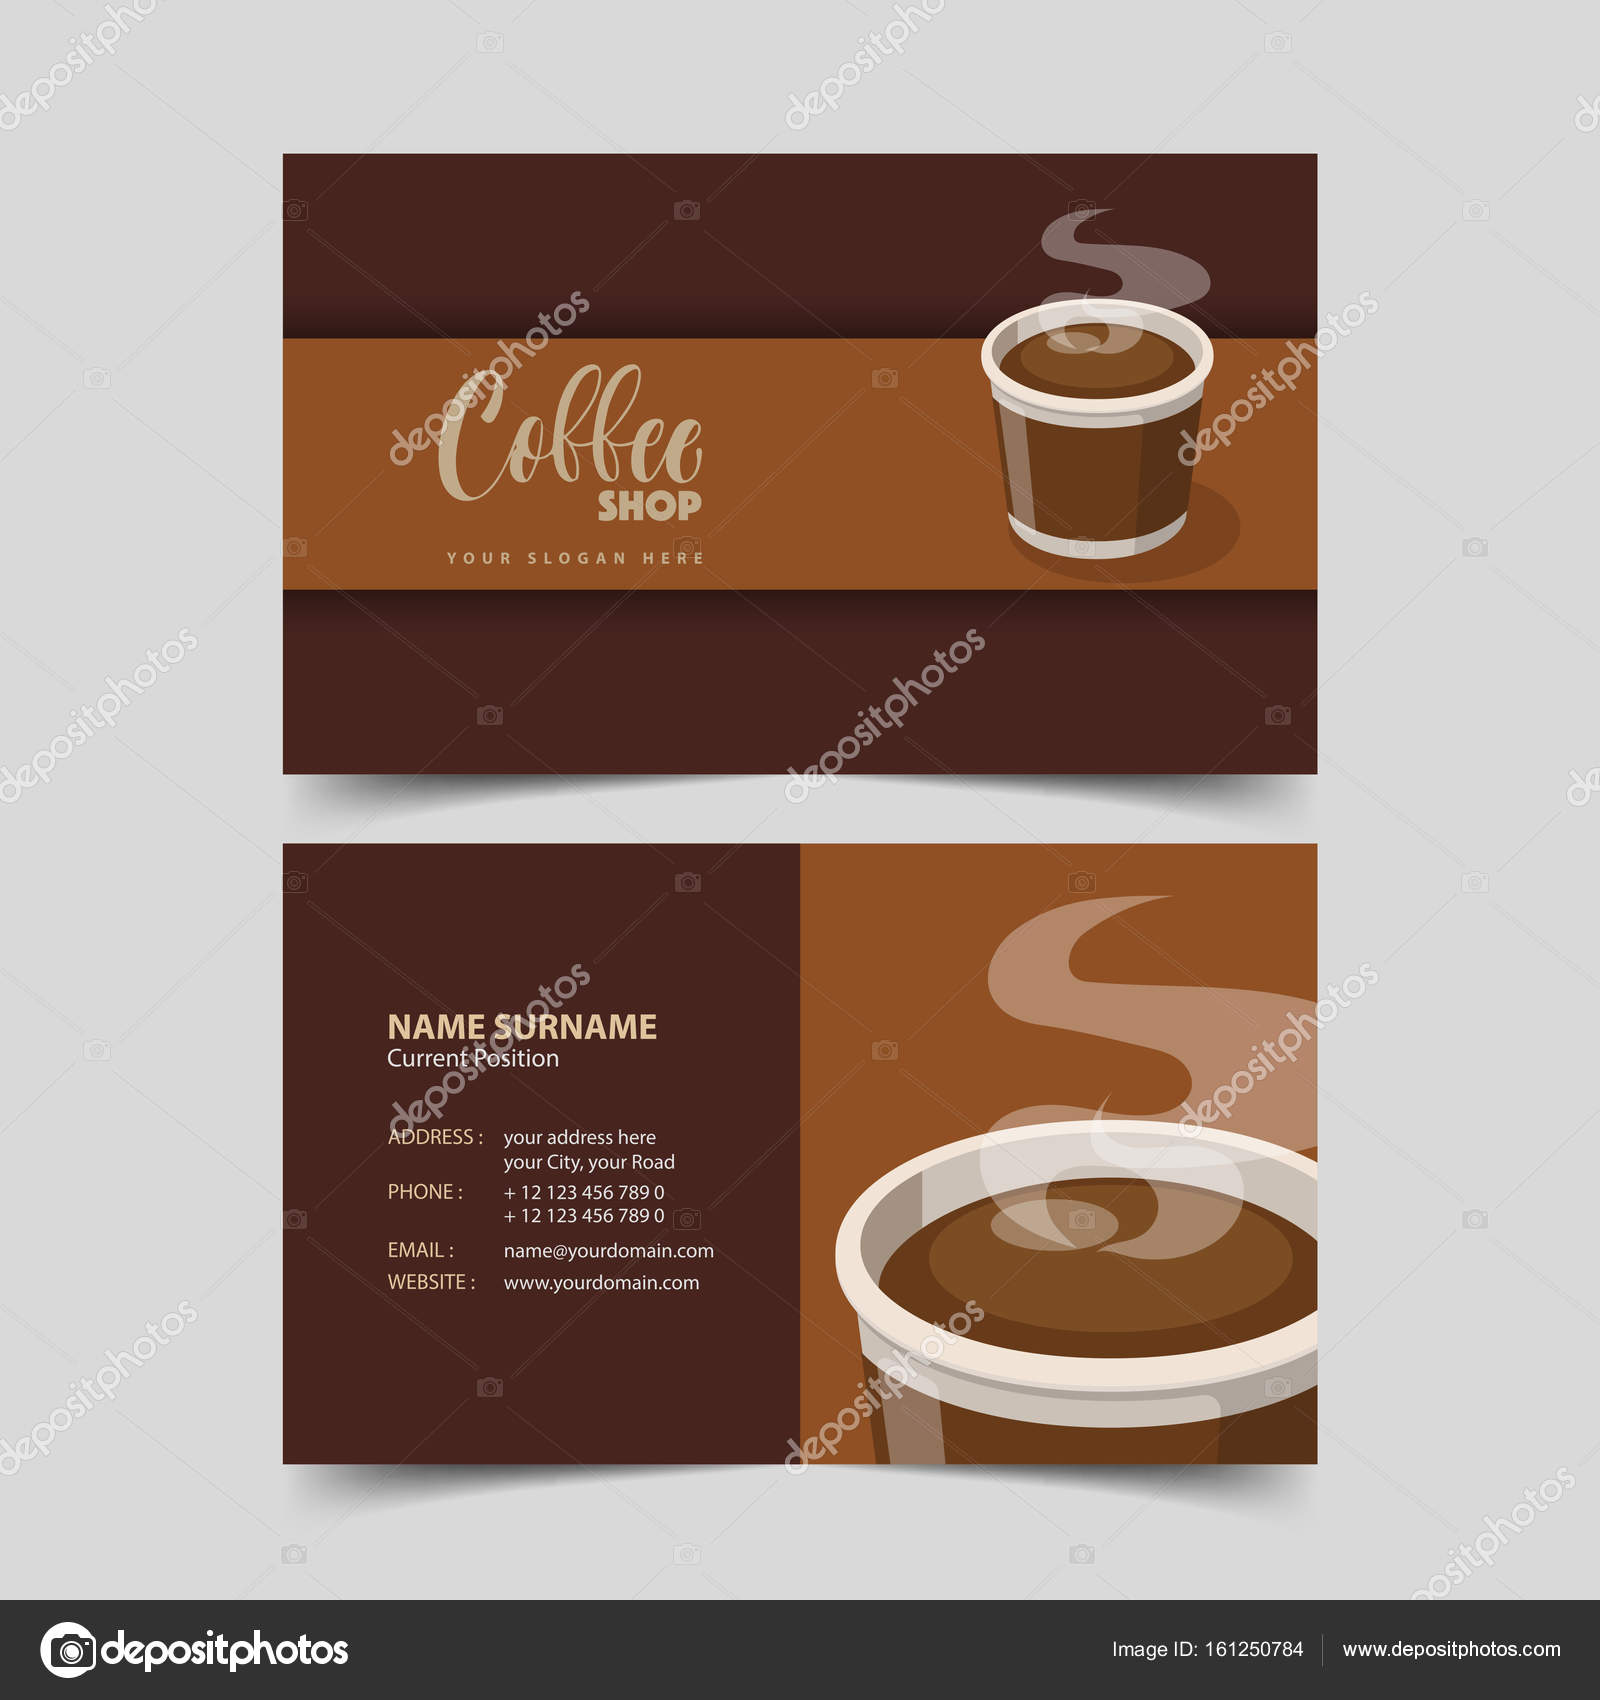 Coffee shop business card design template. — Stock Vector ...